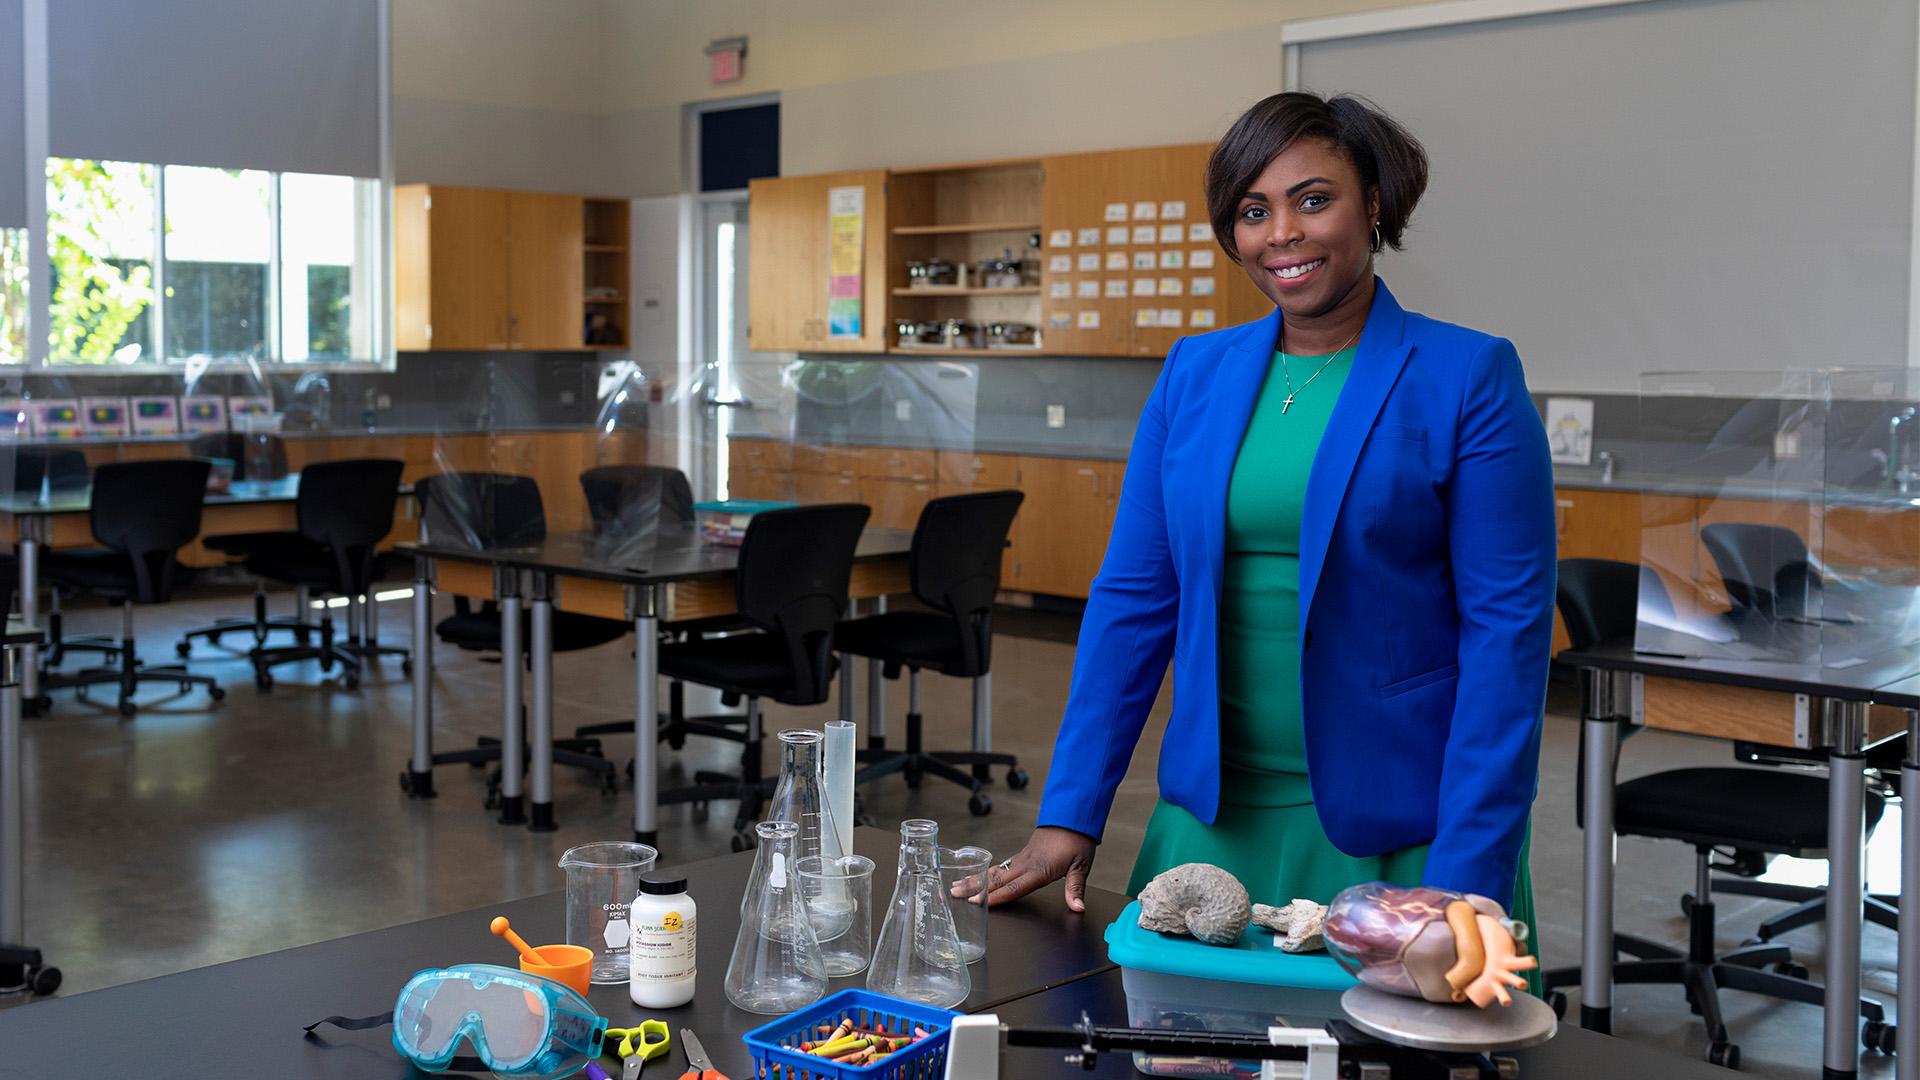 UHCLTeach's new master teacher follows passion for science